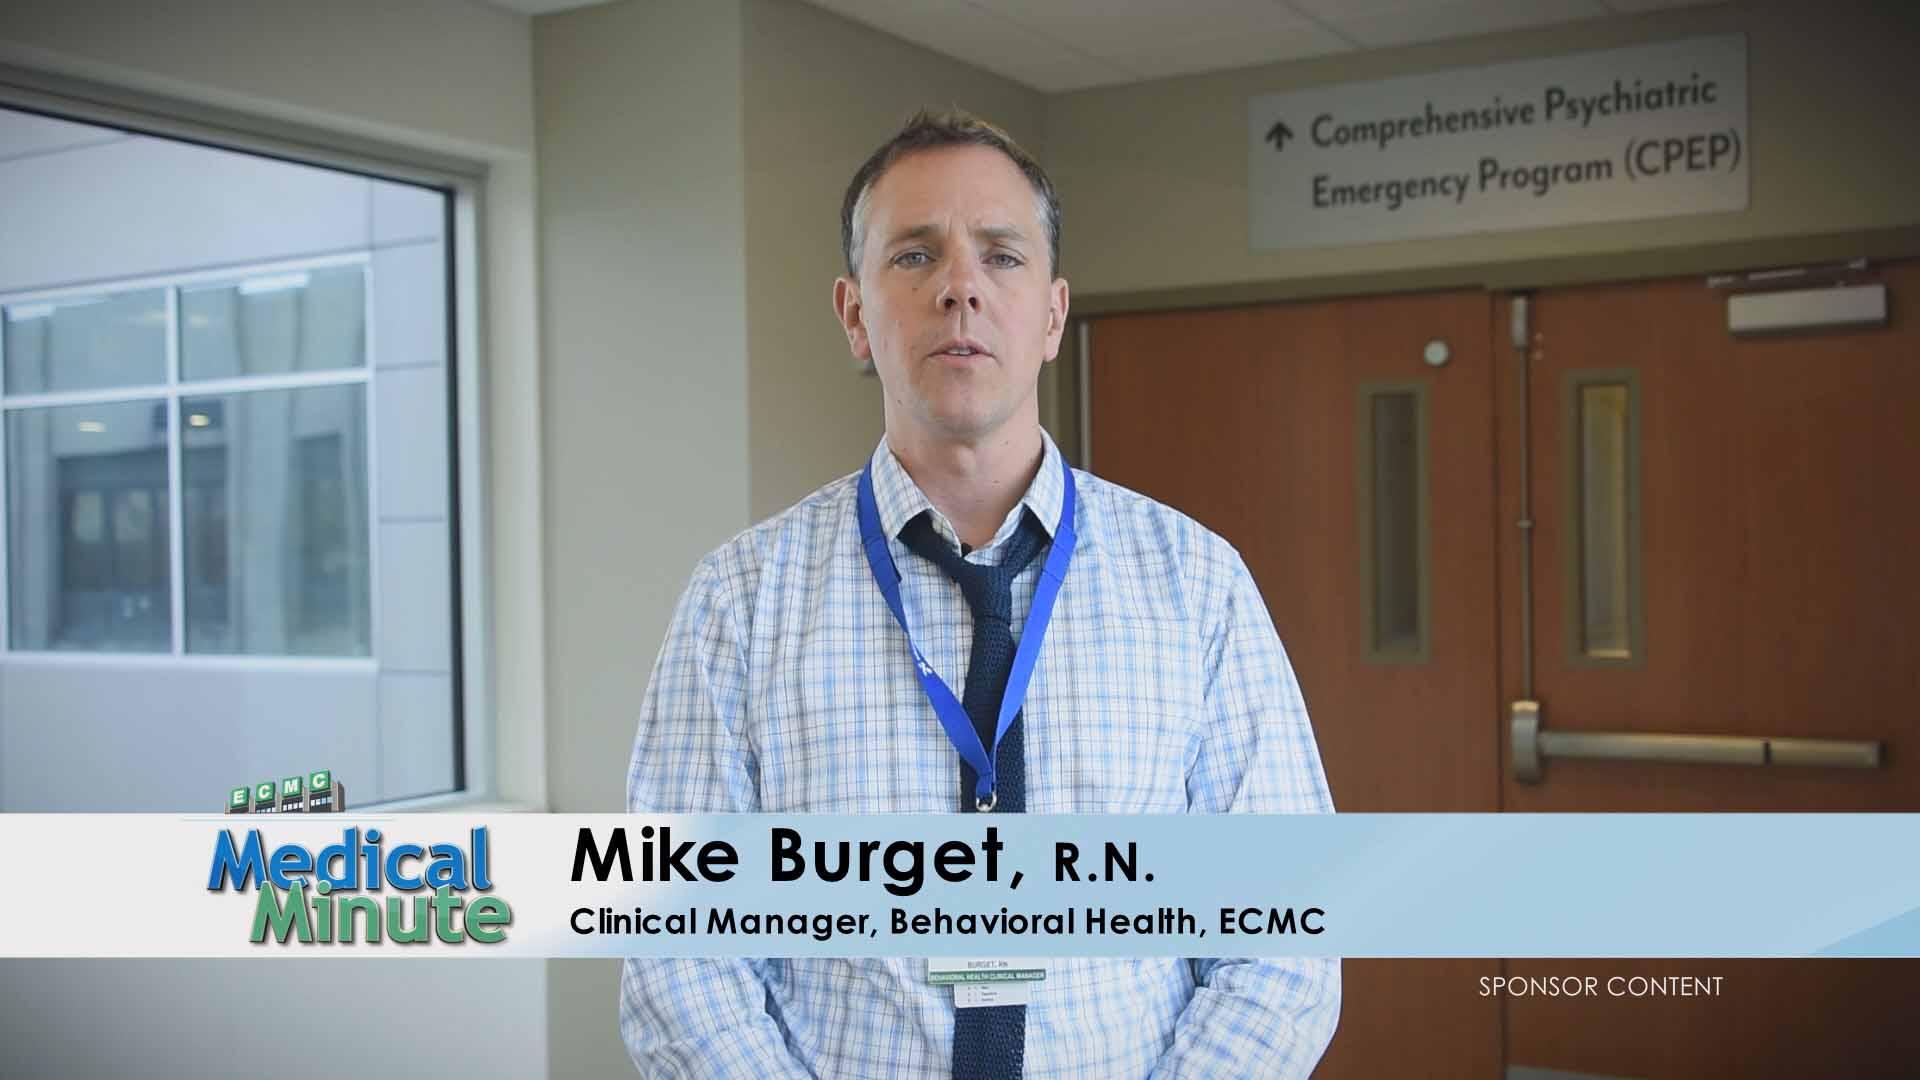 ECMC Medical Minute MikeBurget Suicide 051616 STILL